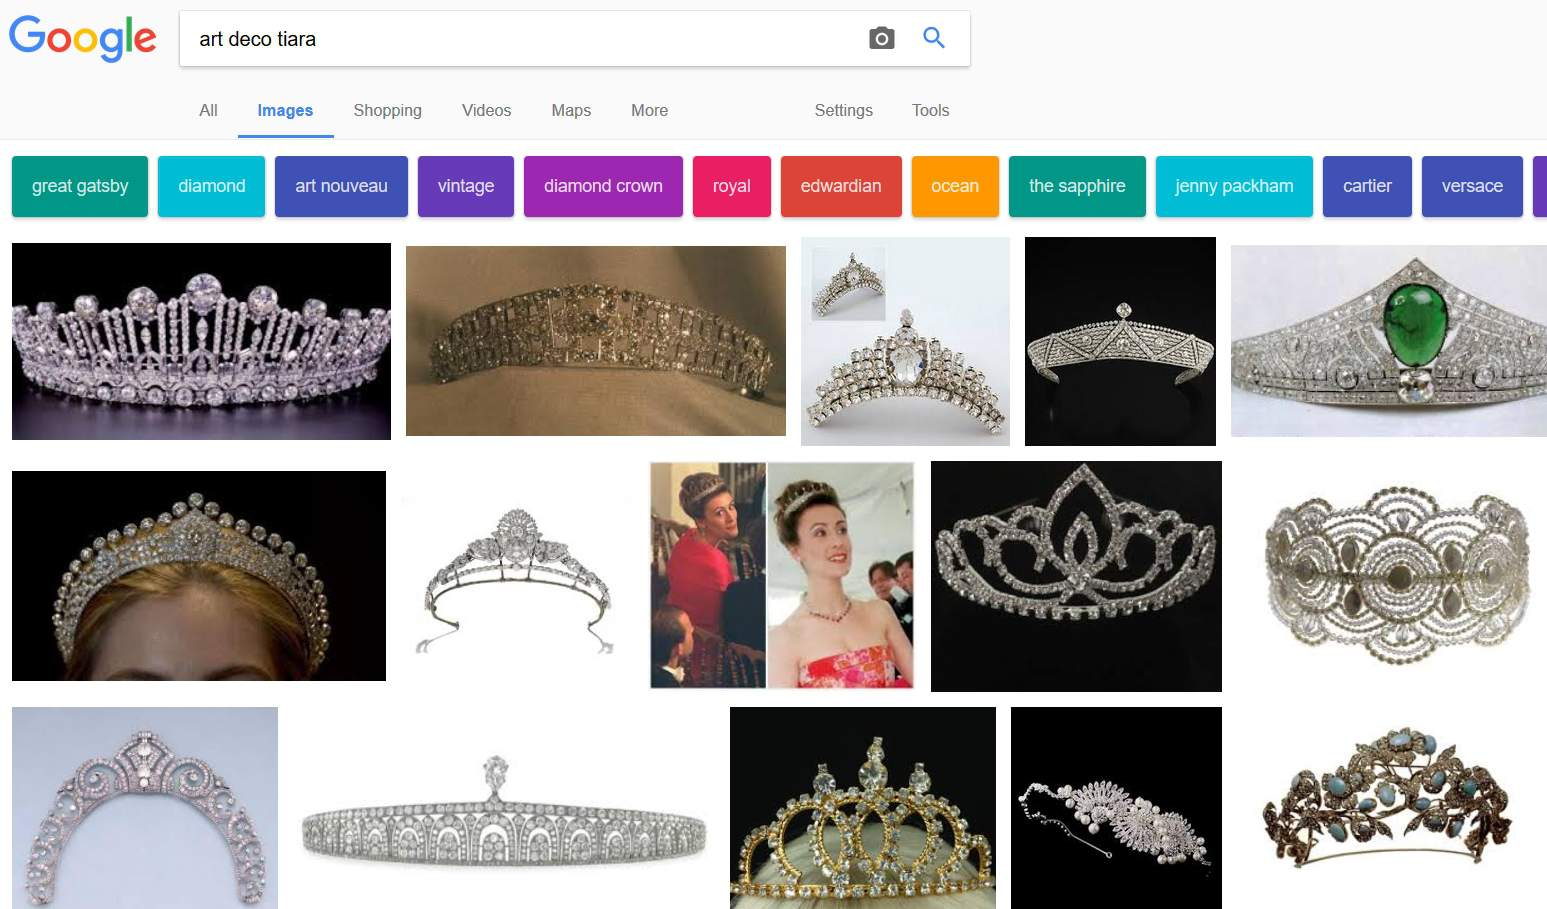 art deco tiara on Google Search